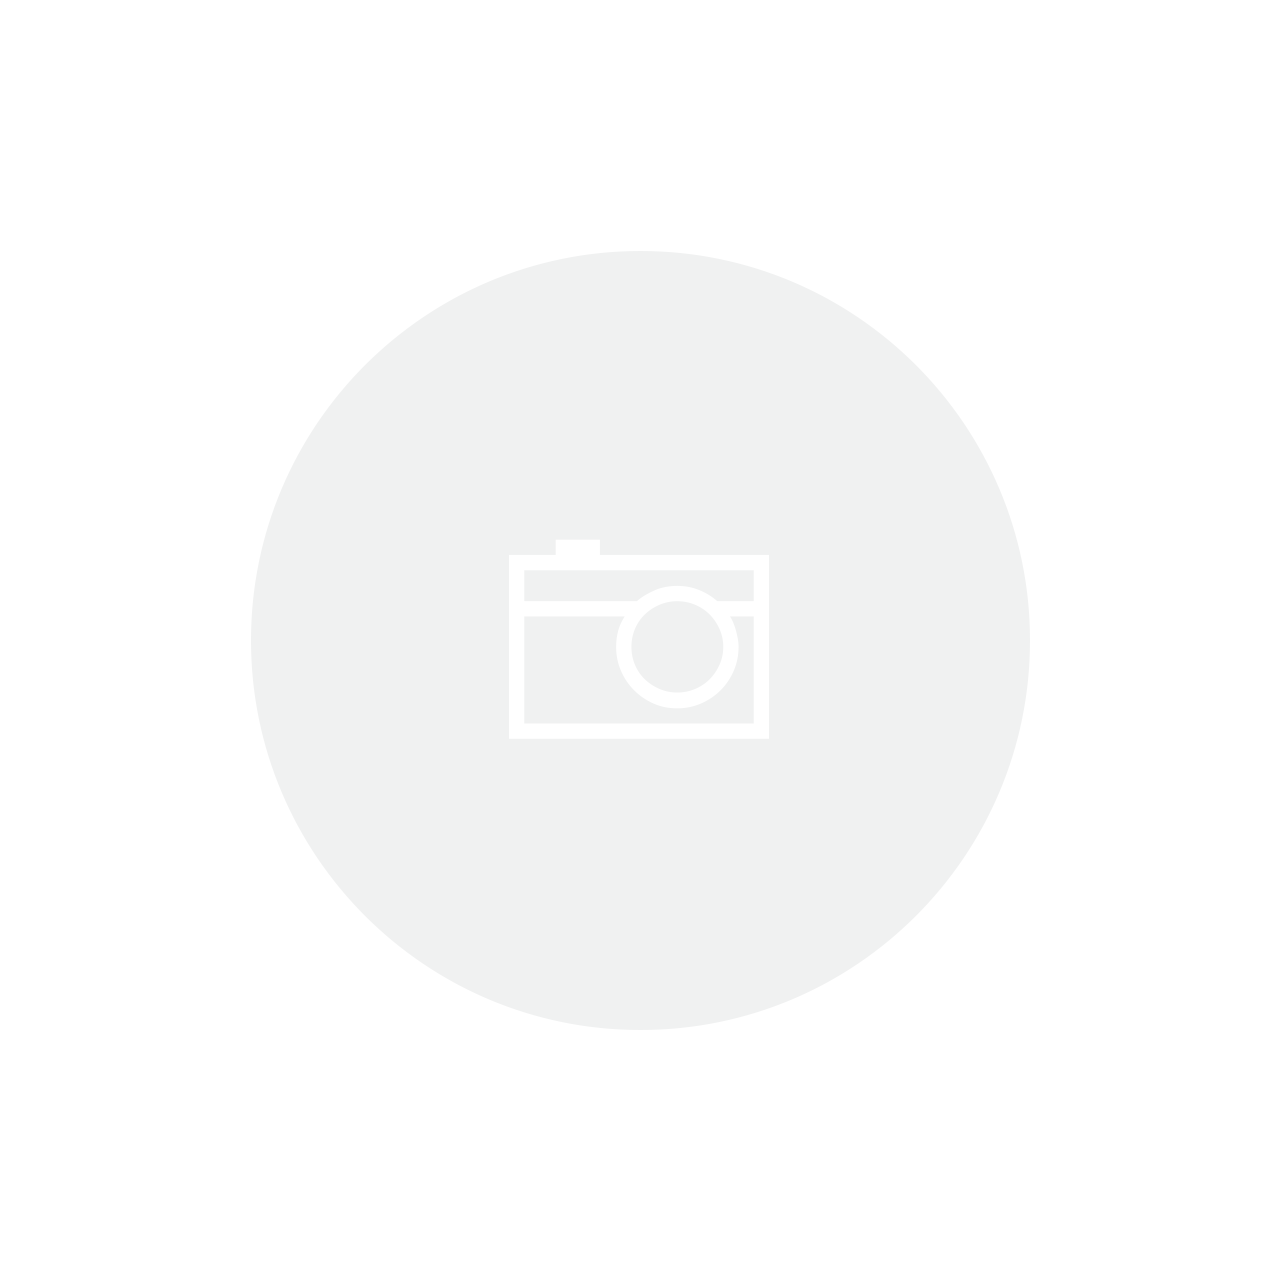 Bandeja Redonda de Zamac Balls Dourado 13,3x13,3x2,3cm